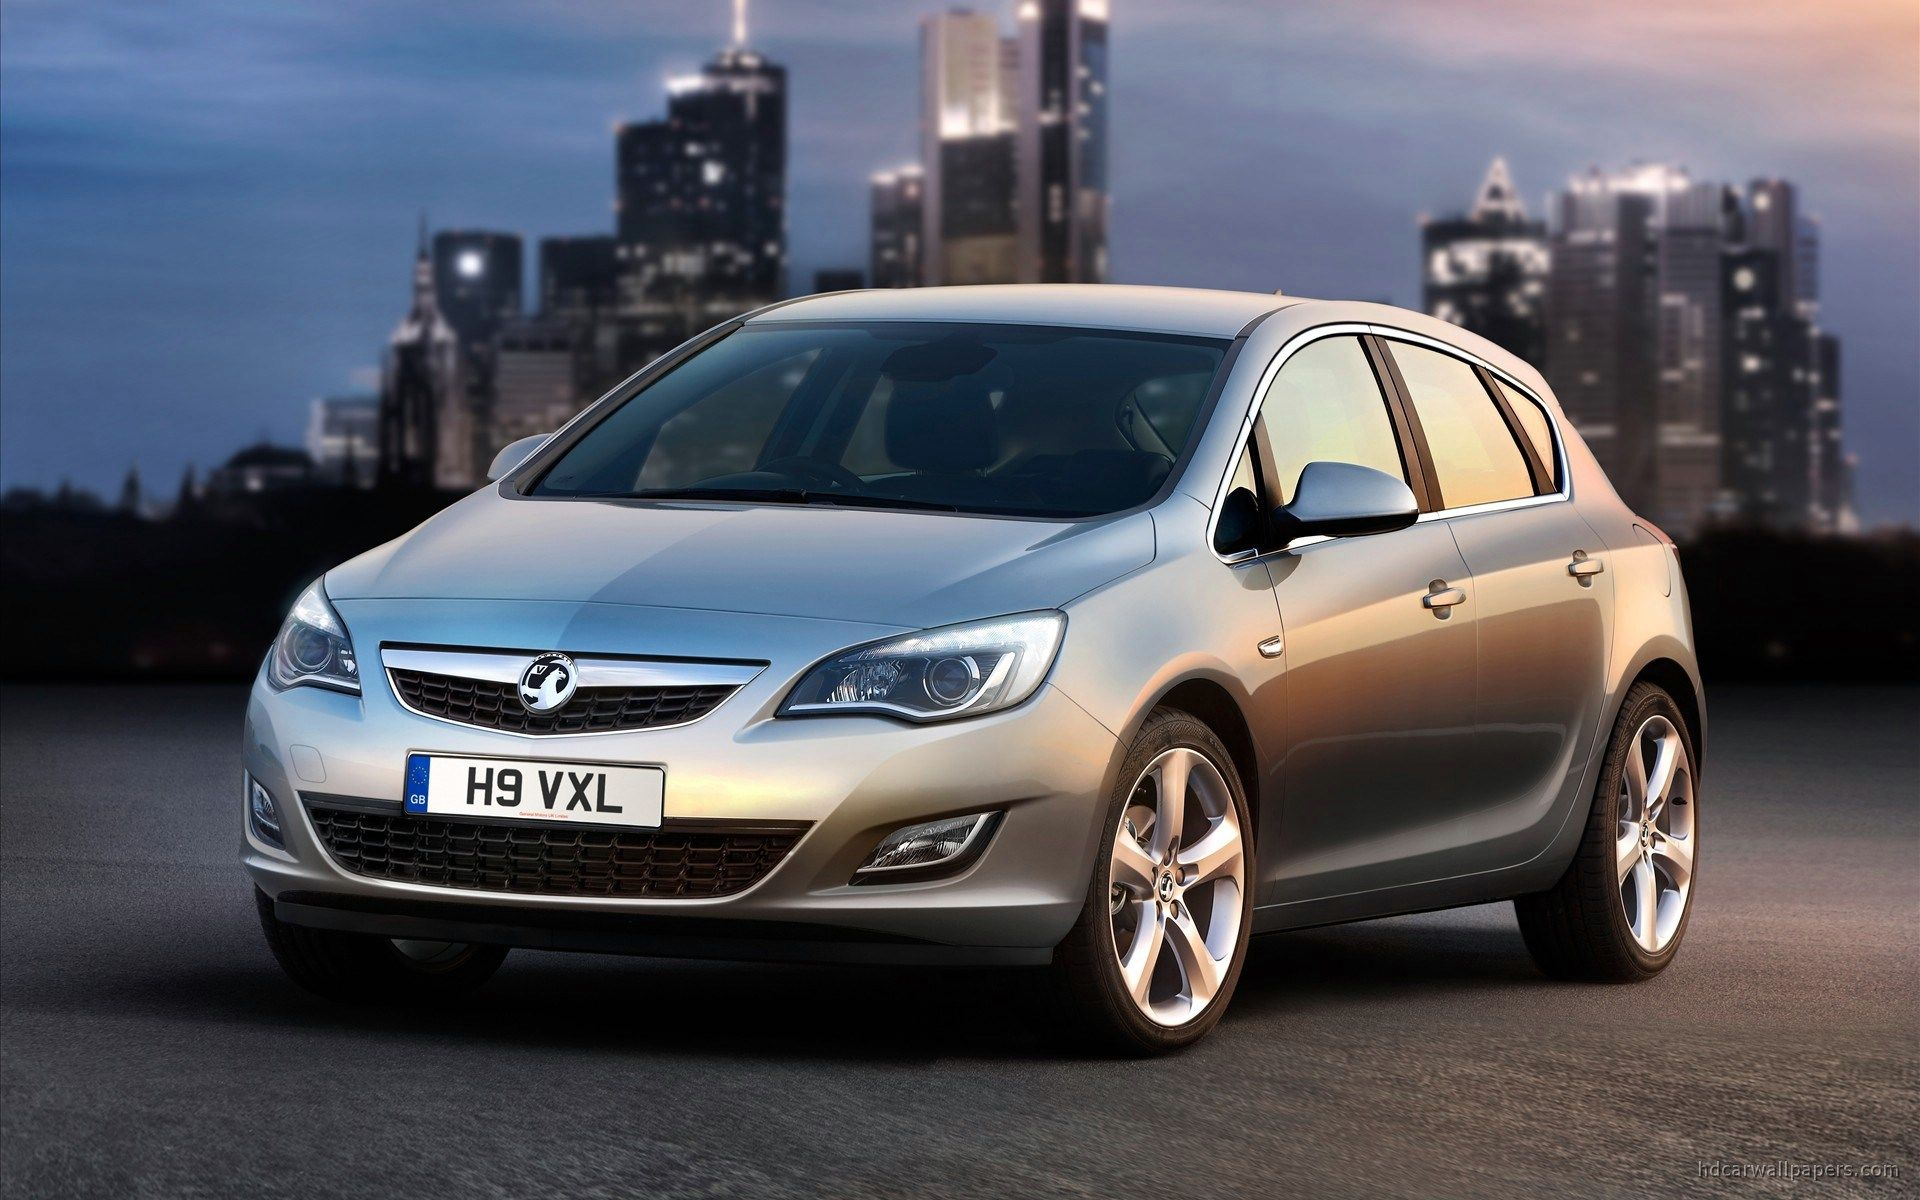 Opel Astra Hd Wallpapers Ololoshenka Car Car Wallpapers Bmw Cars